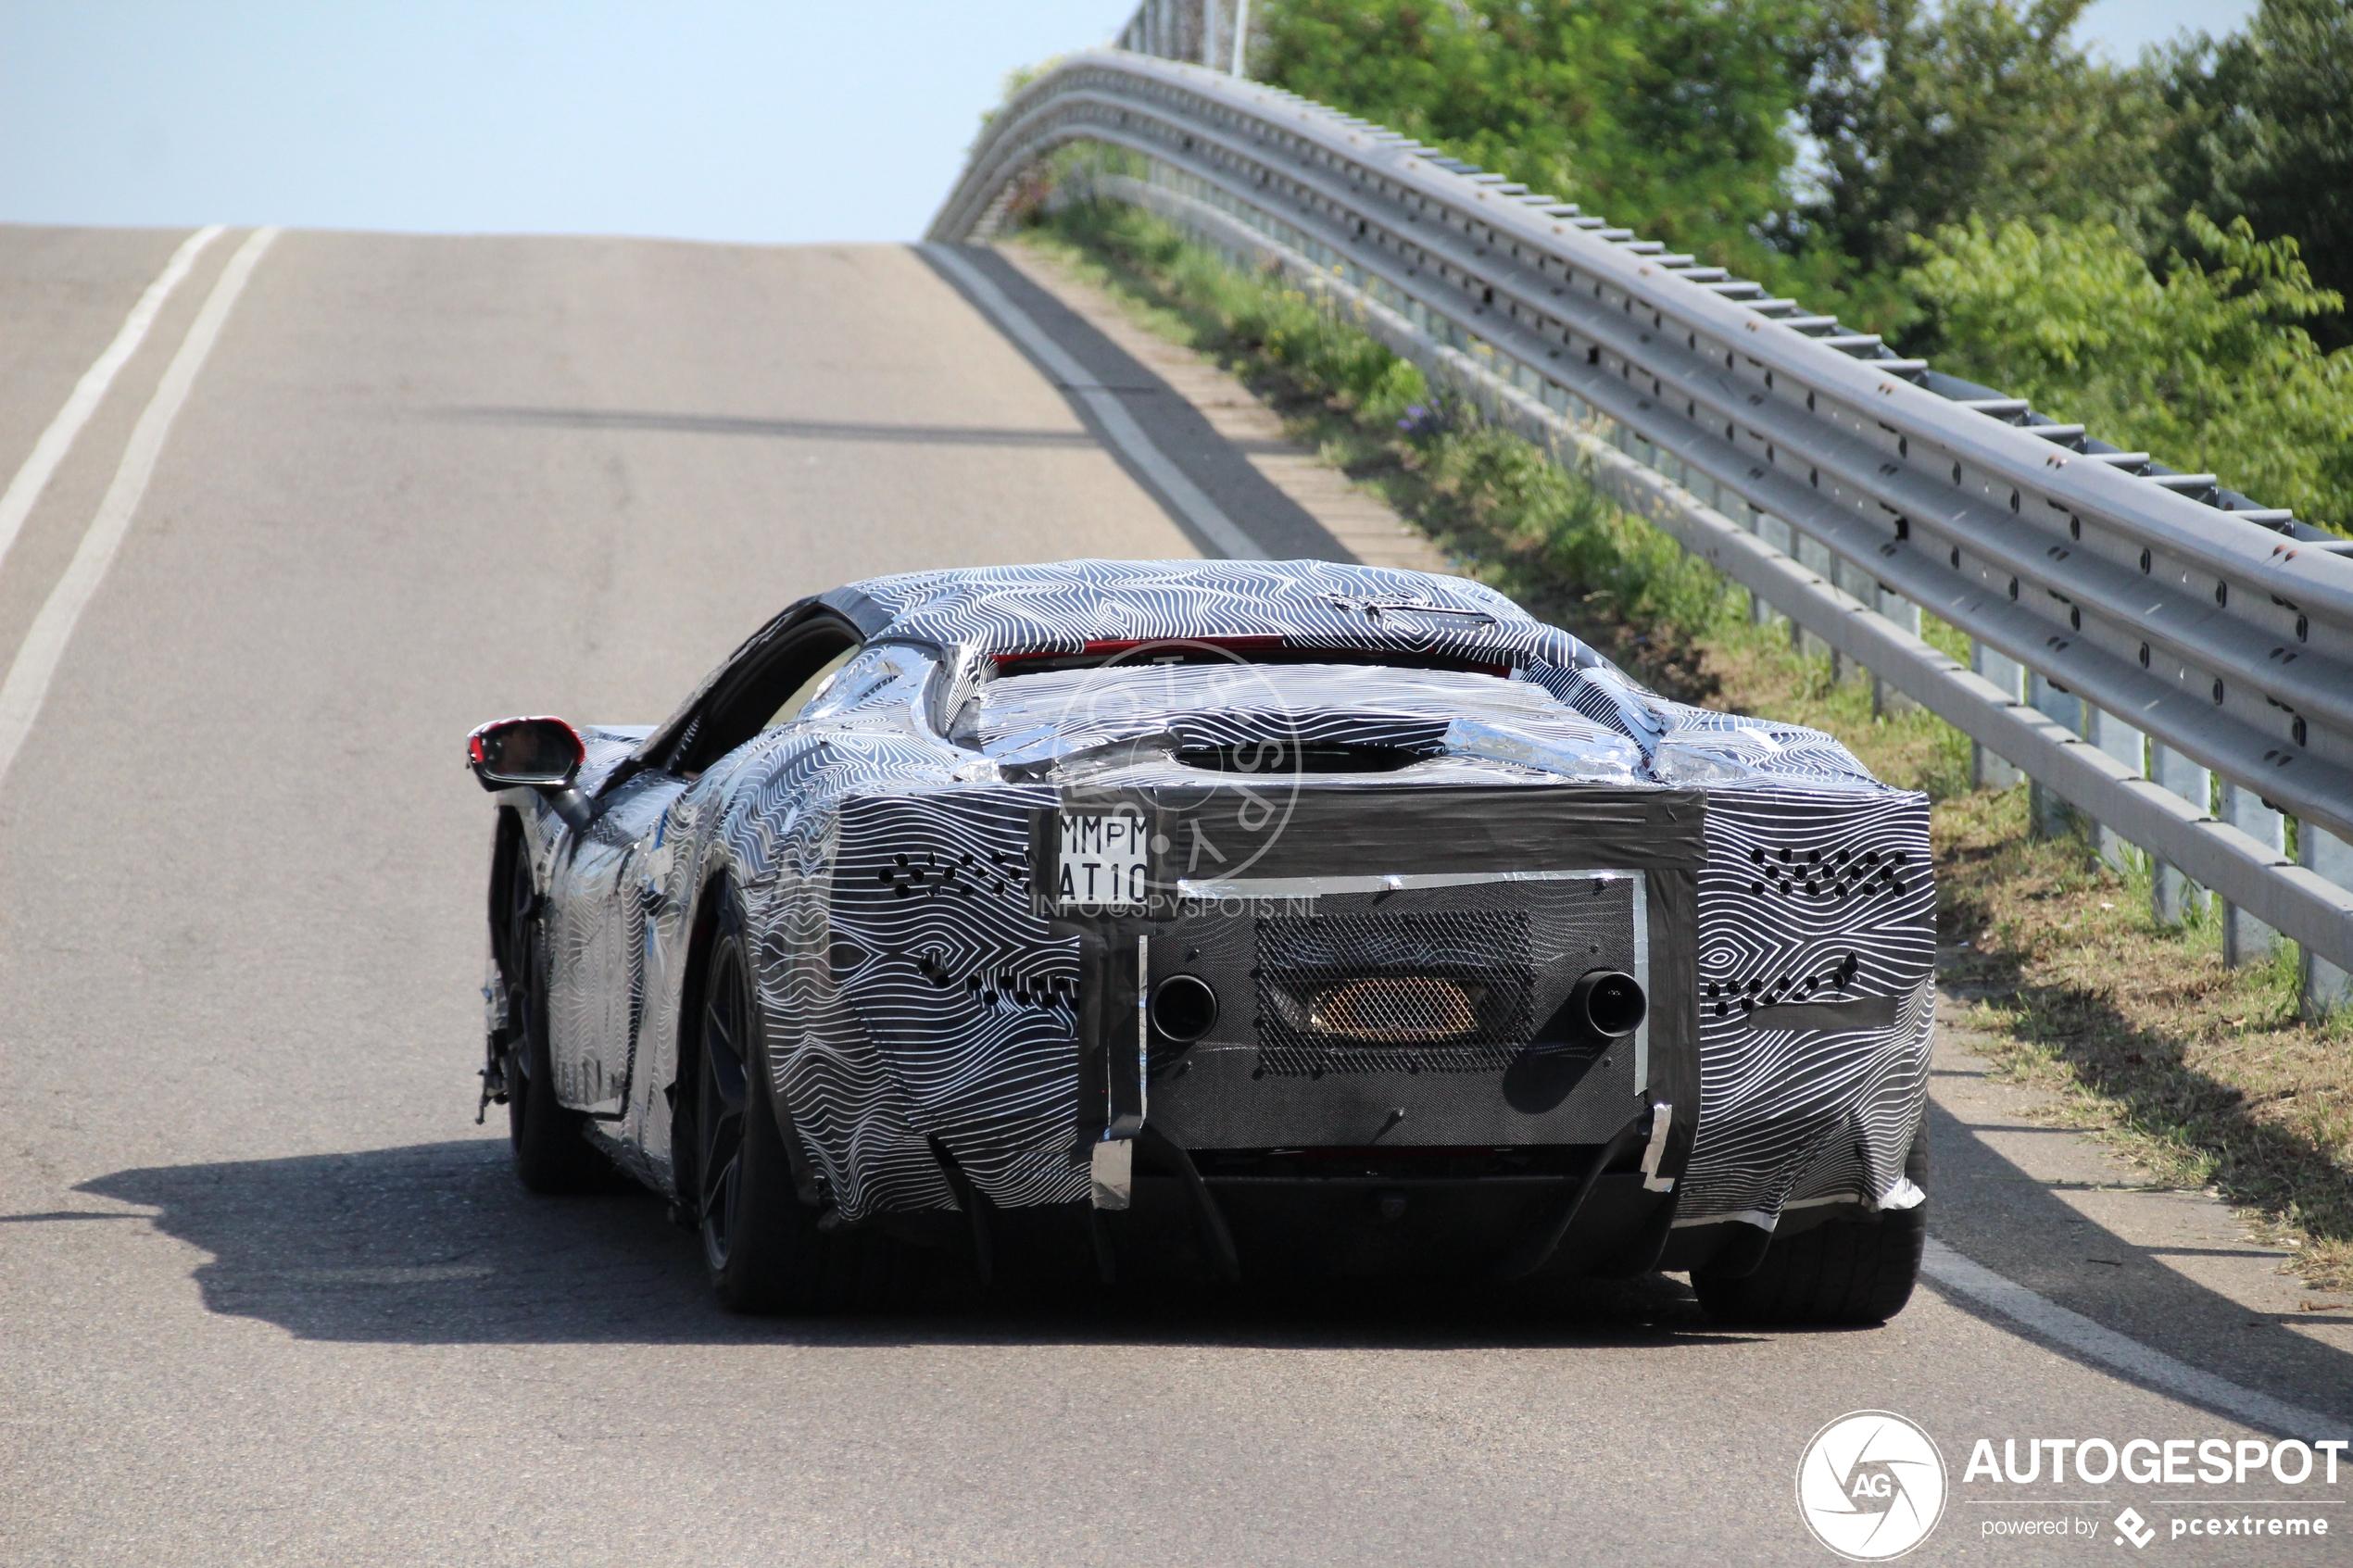 Do we see the successor to the Ferrari F8 Tributo here?